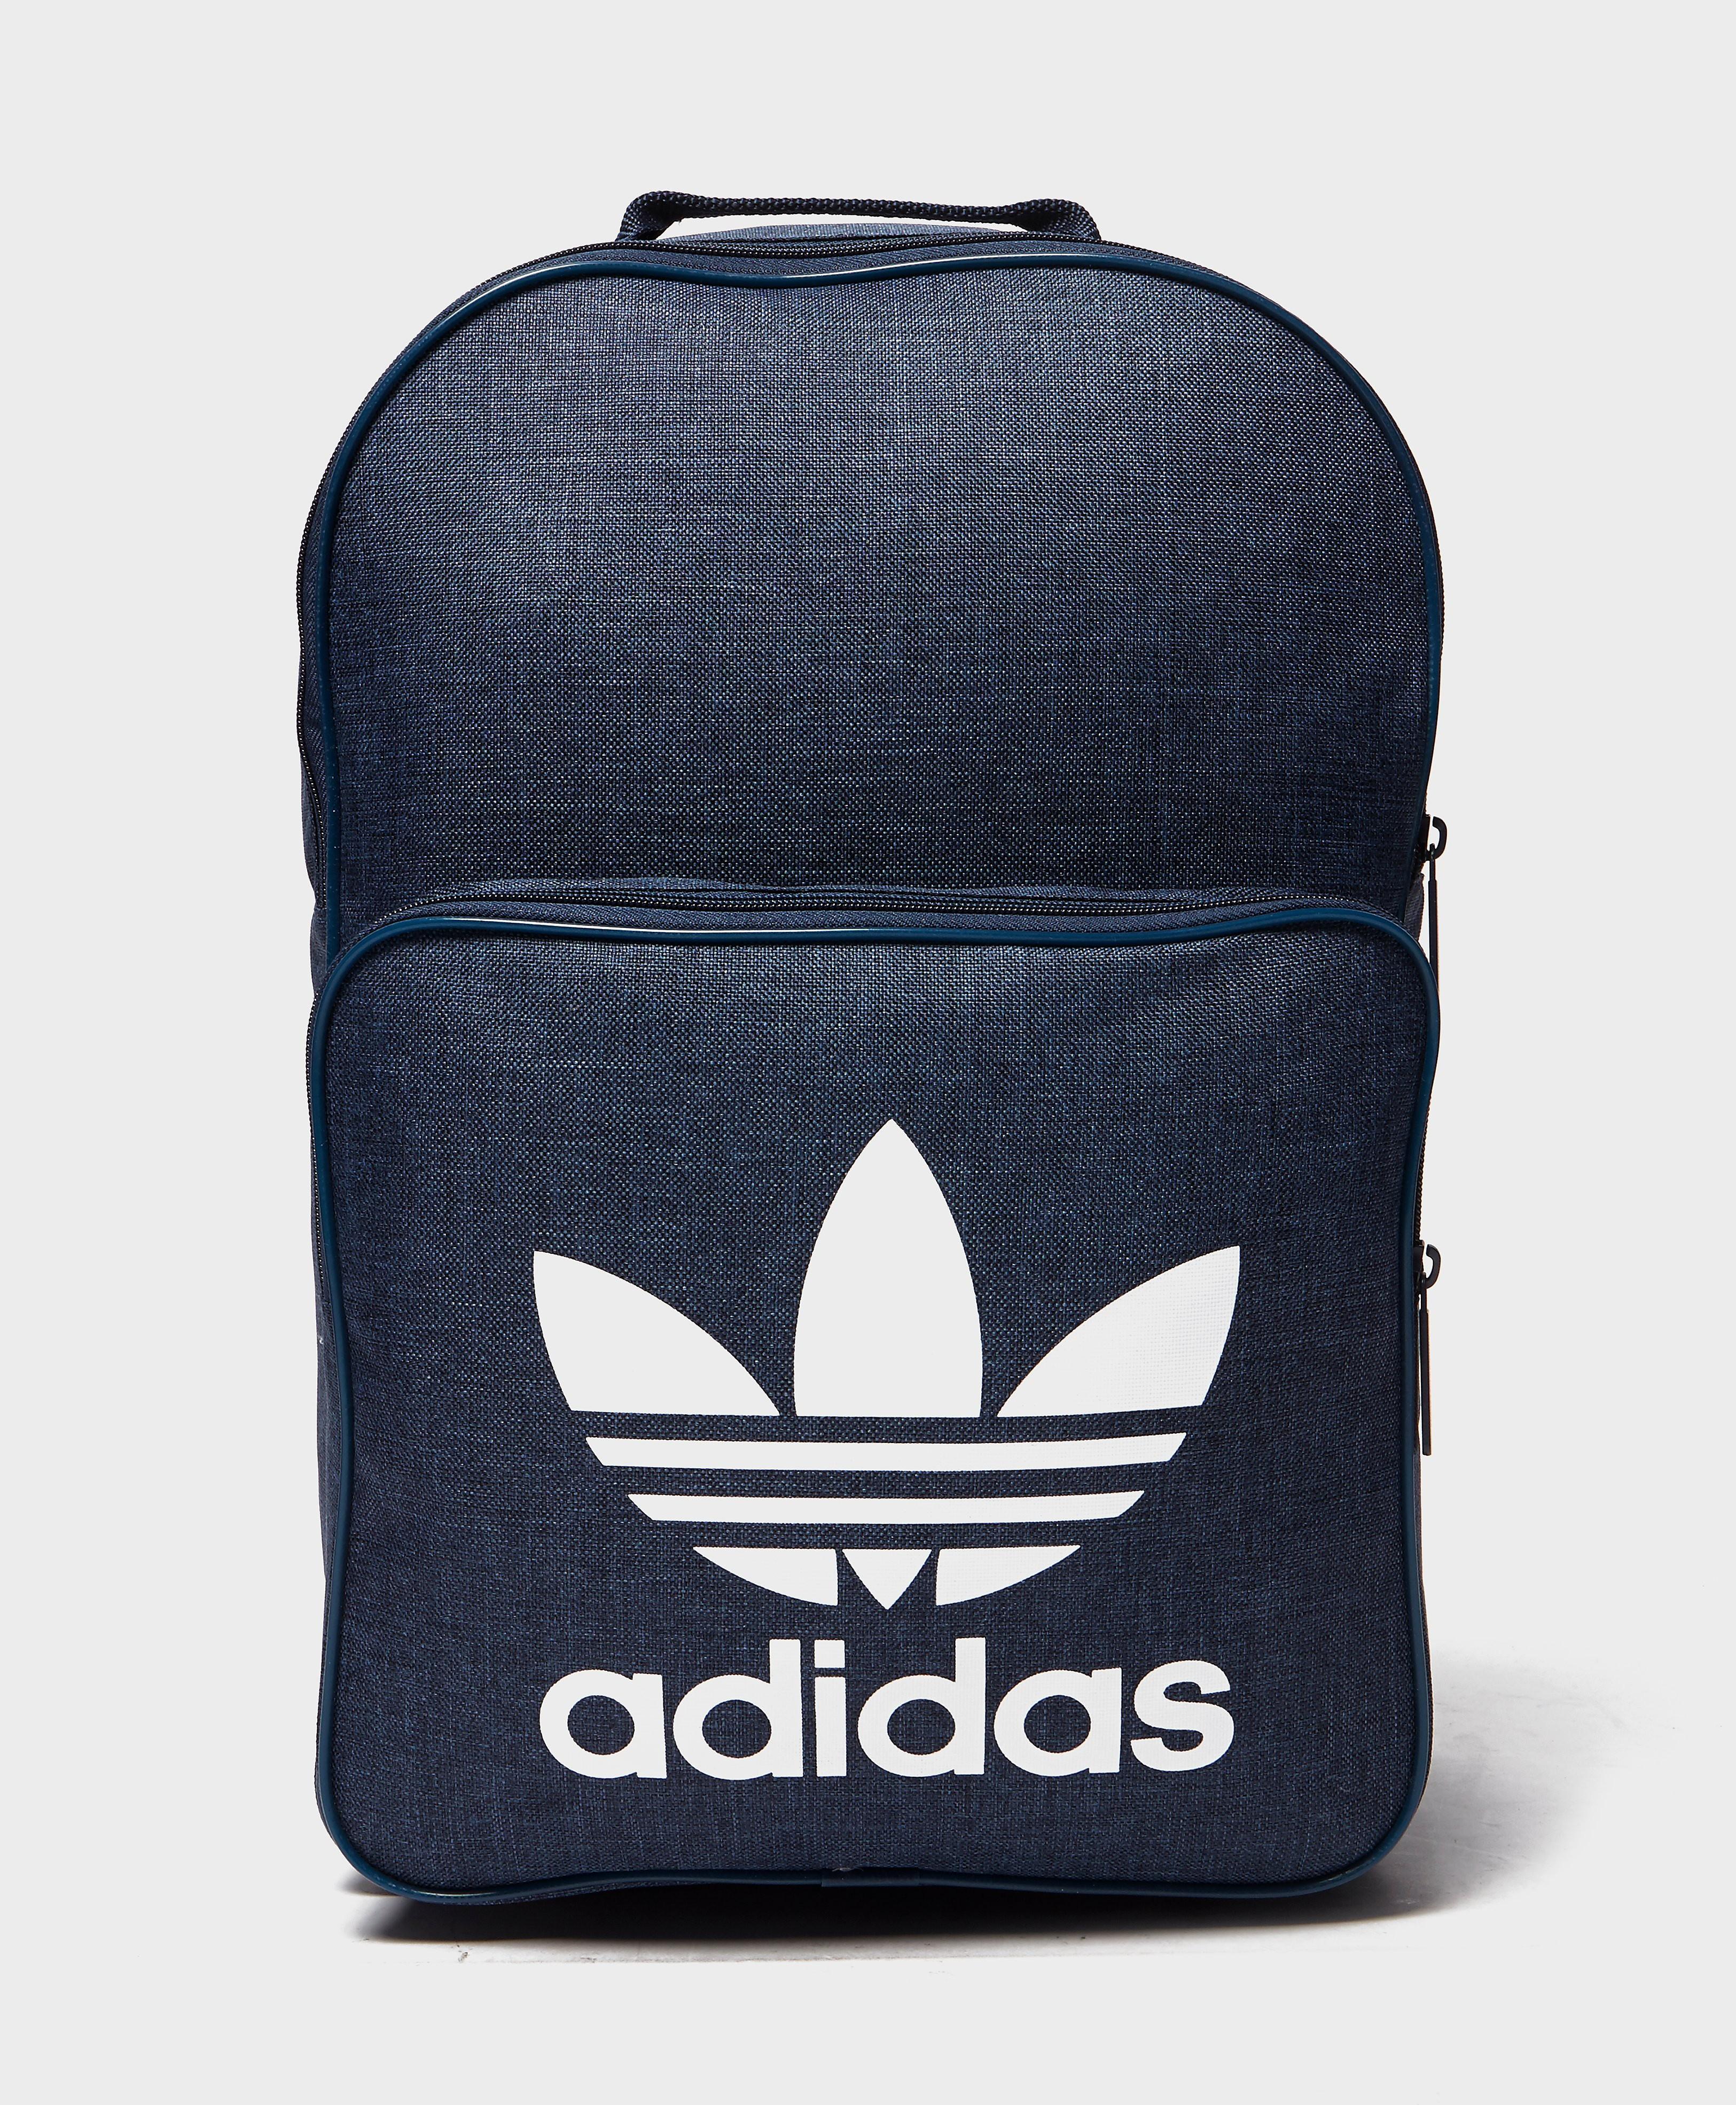 adidas Originals Classic Backpack  Navy Navy